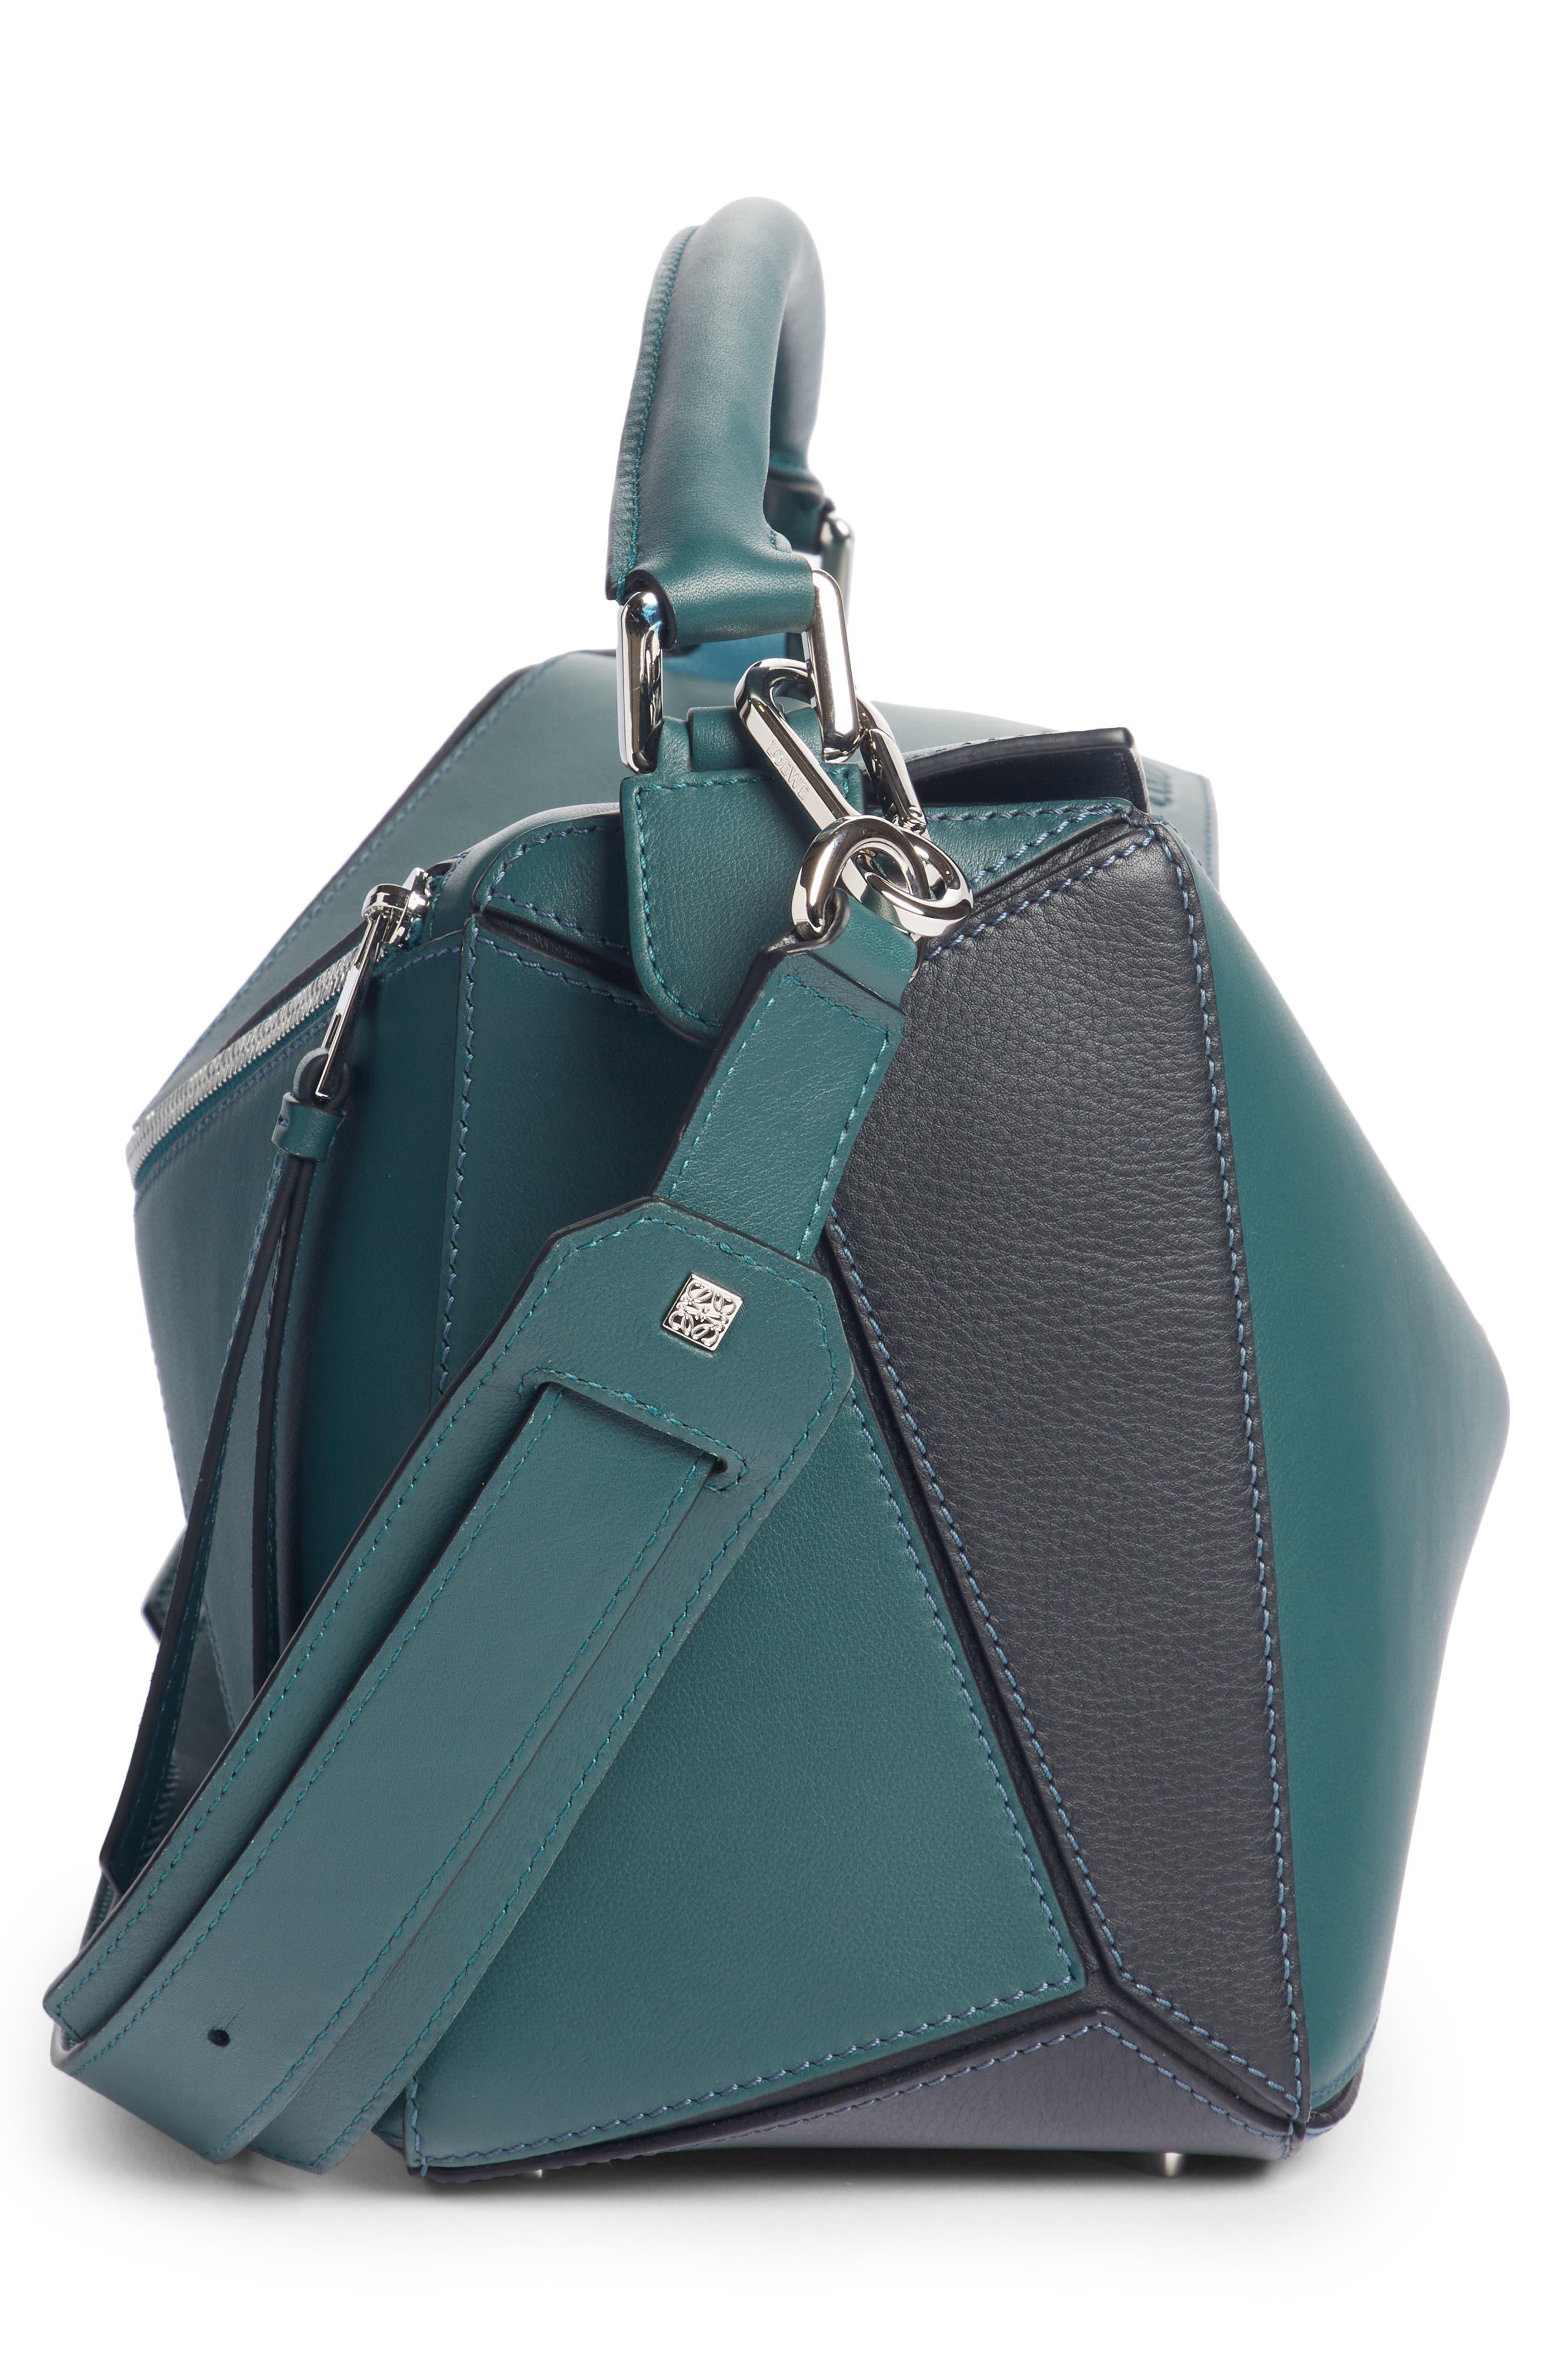 Medium Puzzle Calfskin Leather Shoulder Bag,                             Alternate thumbnail 4, color,                             PETROLEUM BLUE/ CYPRESS